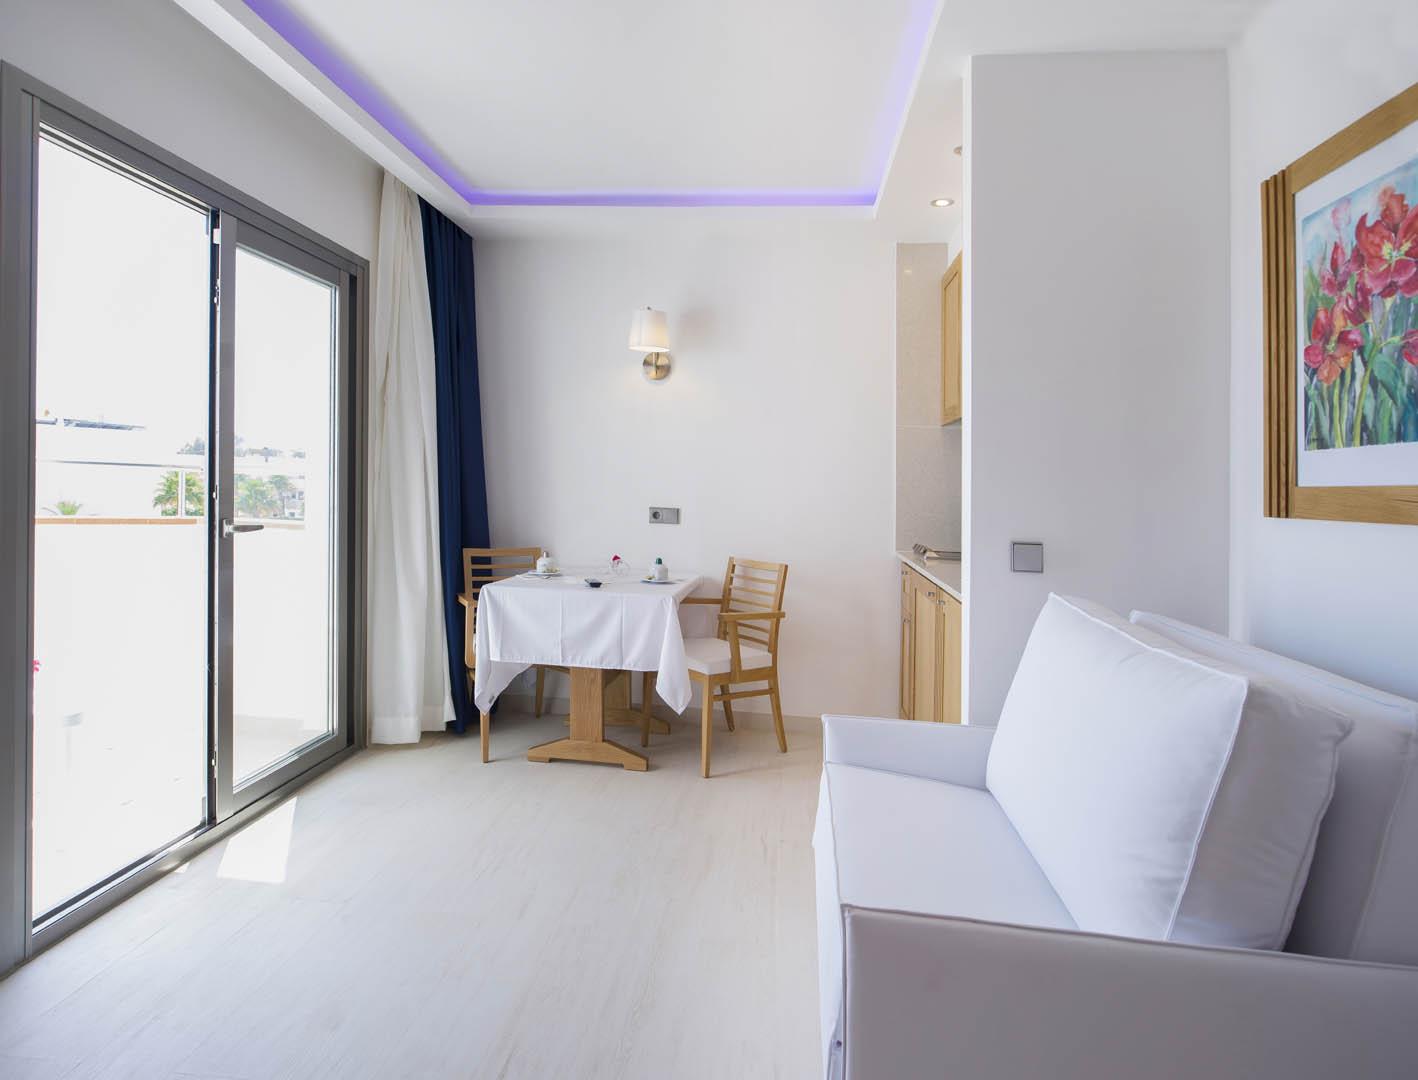 http://www.apartamentosbonsol-ibiza.com/wp-content/uploads/2016/02/09.jpg